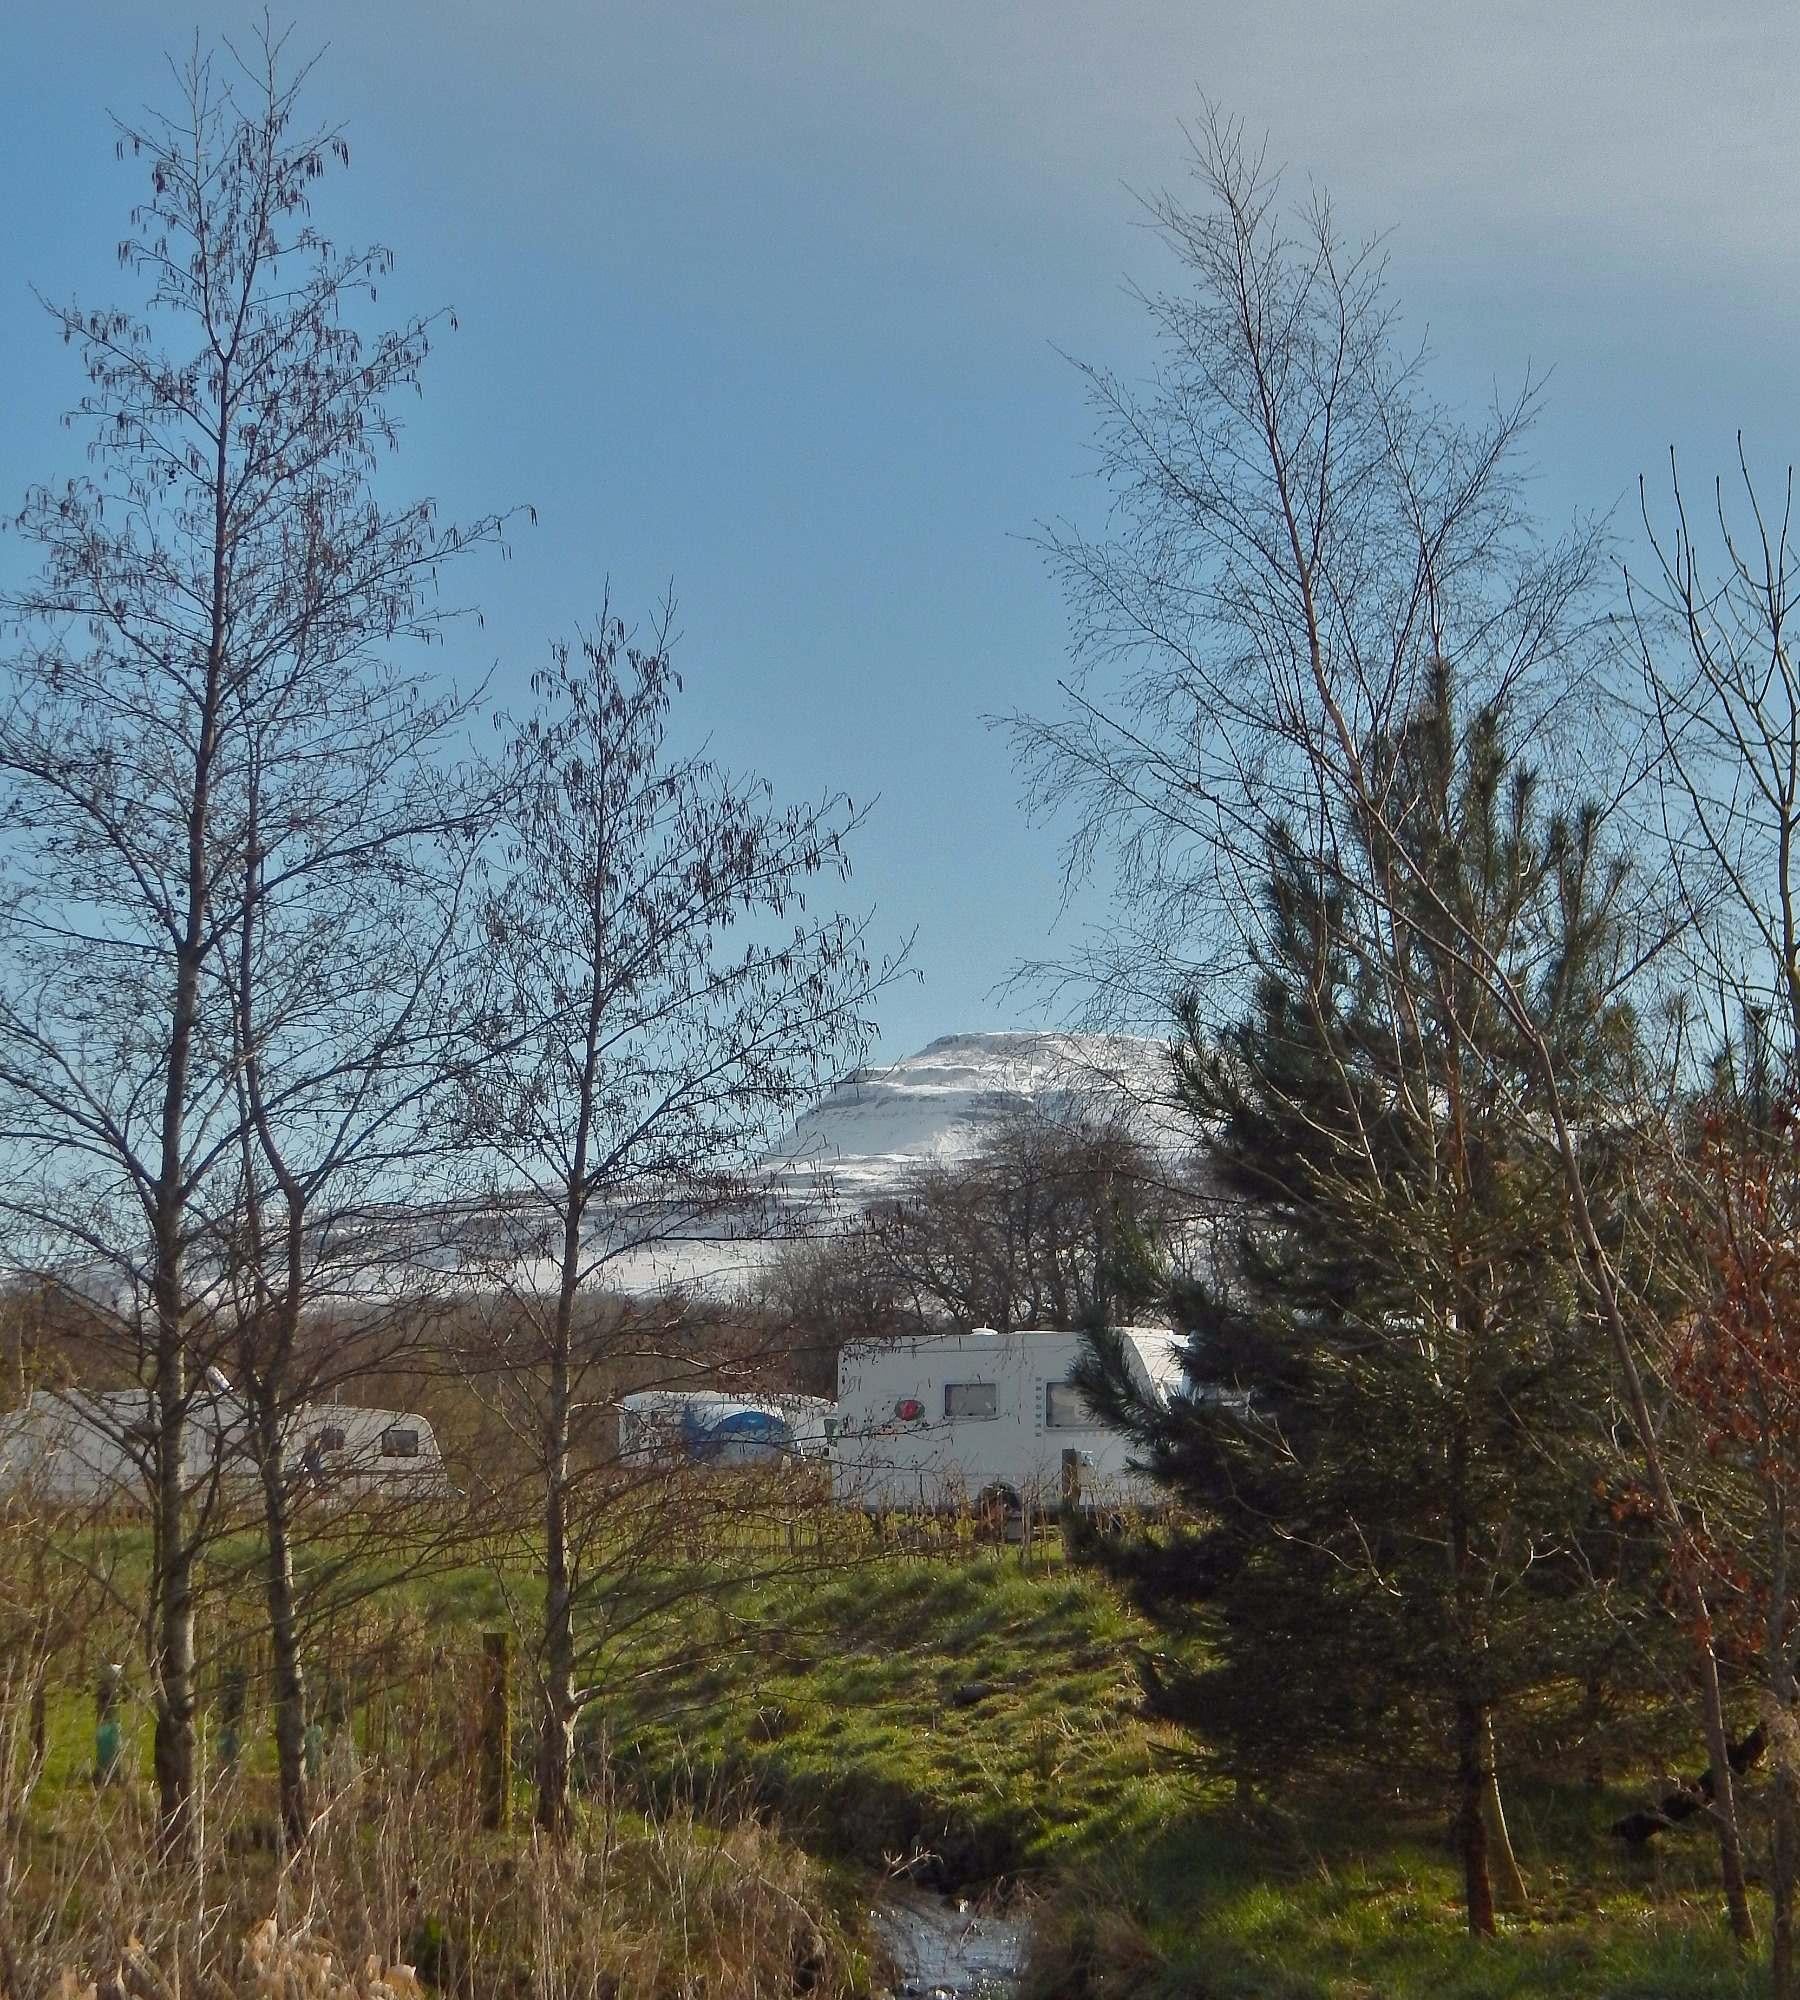 Snowy morning at Thornbrook Barn Caravan Site